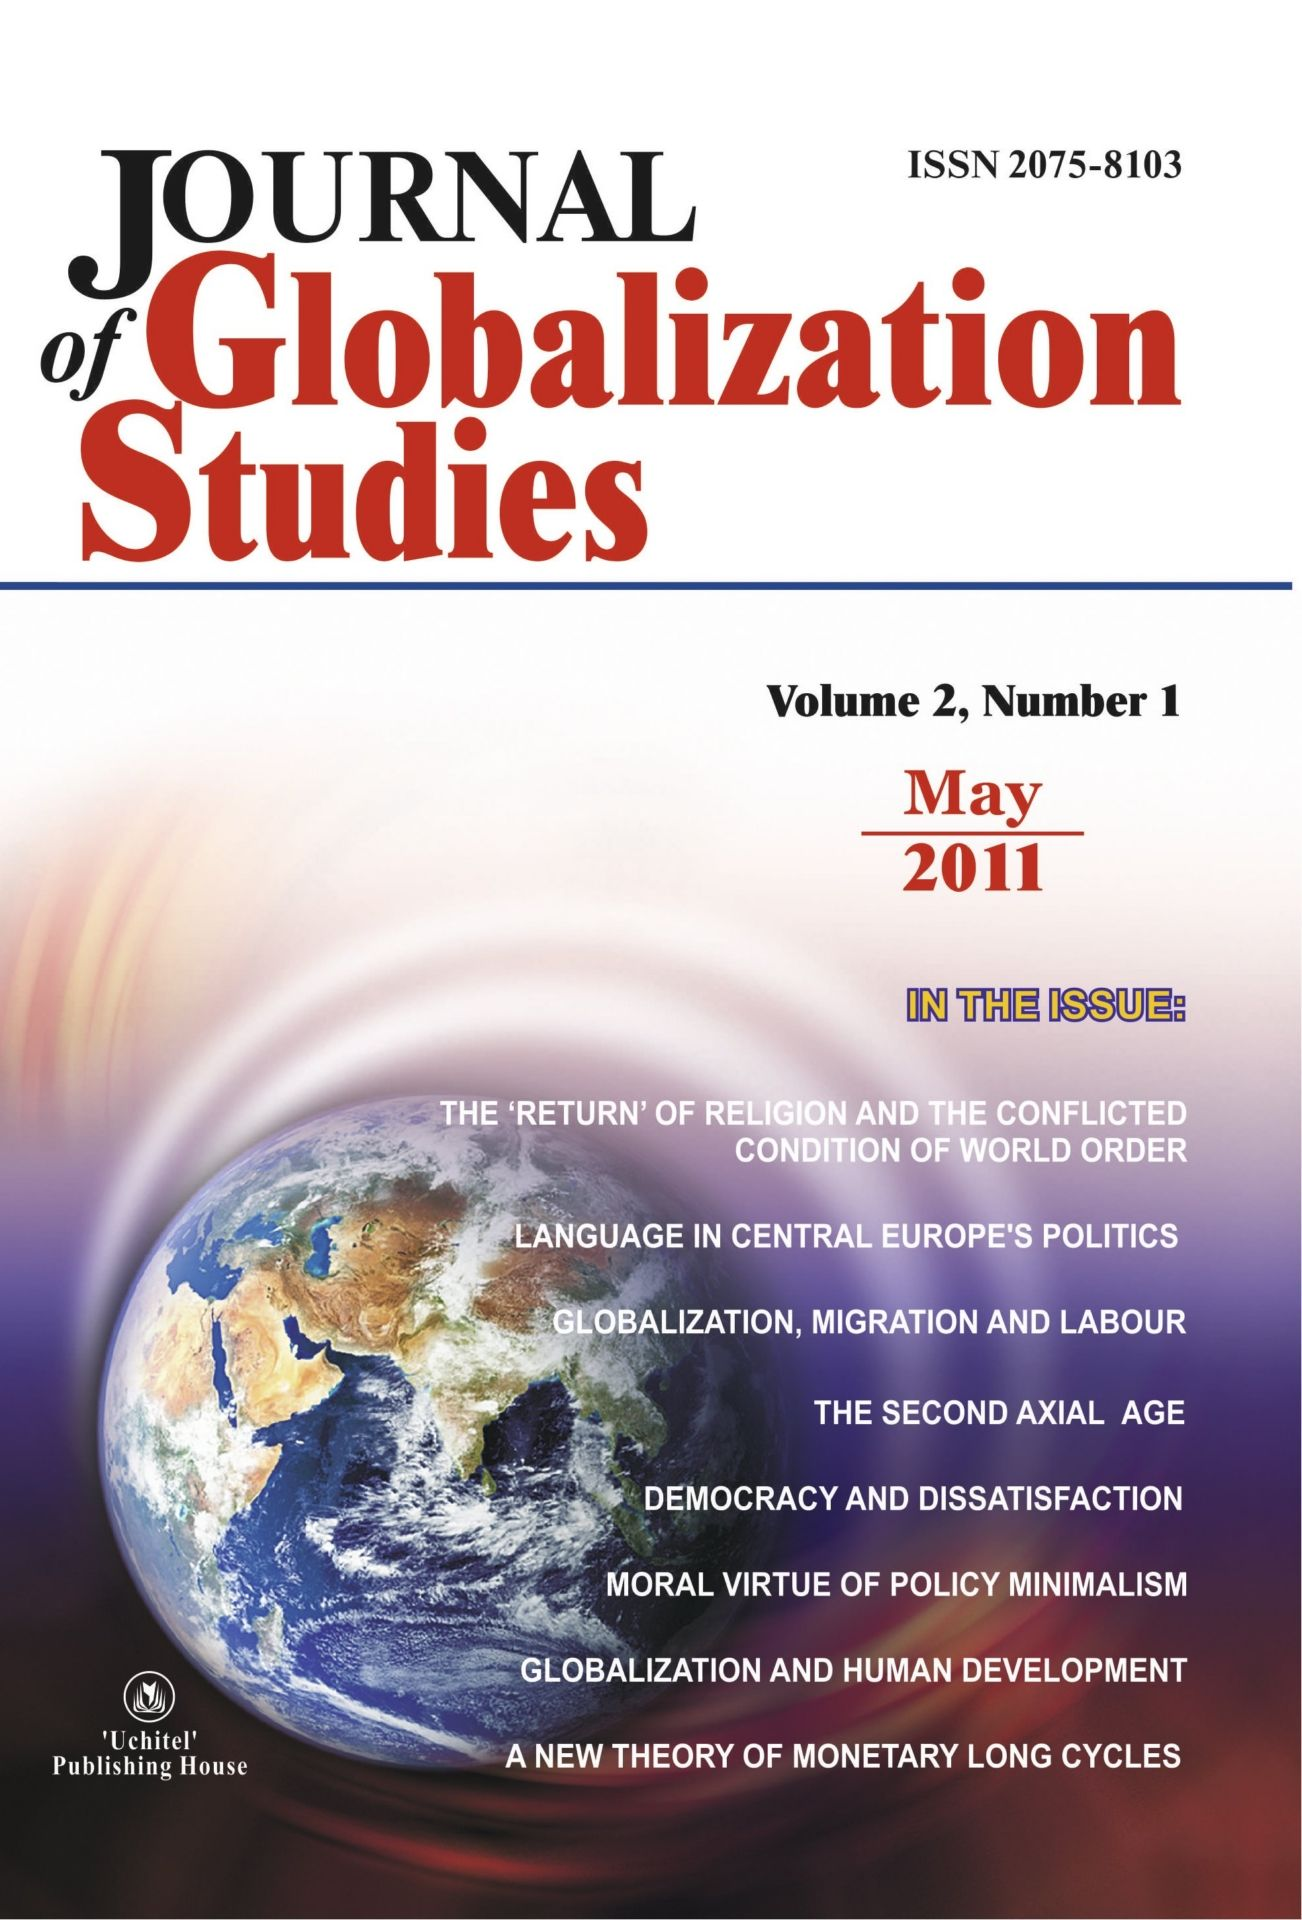 Journal of Globalization Studies Volume 2, Number 1, 2011 г. Журнал глобализационных исследований Международный журнал на английском языке.